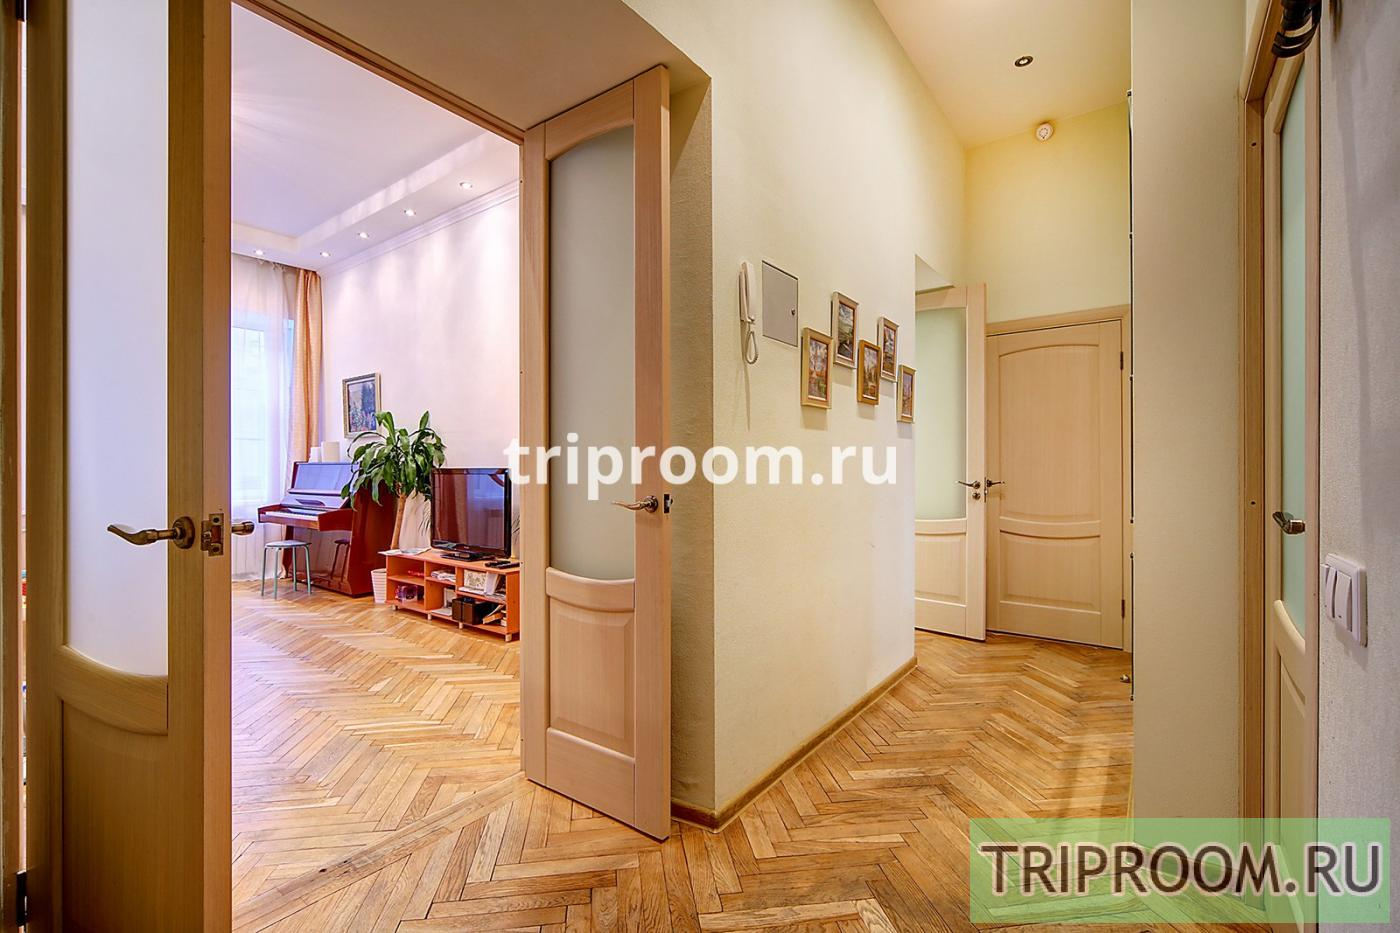 2-комнатная квартира посуточно (вариант № 15426), ул. Лиговский проспект, фото № 11